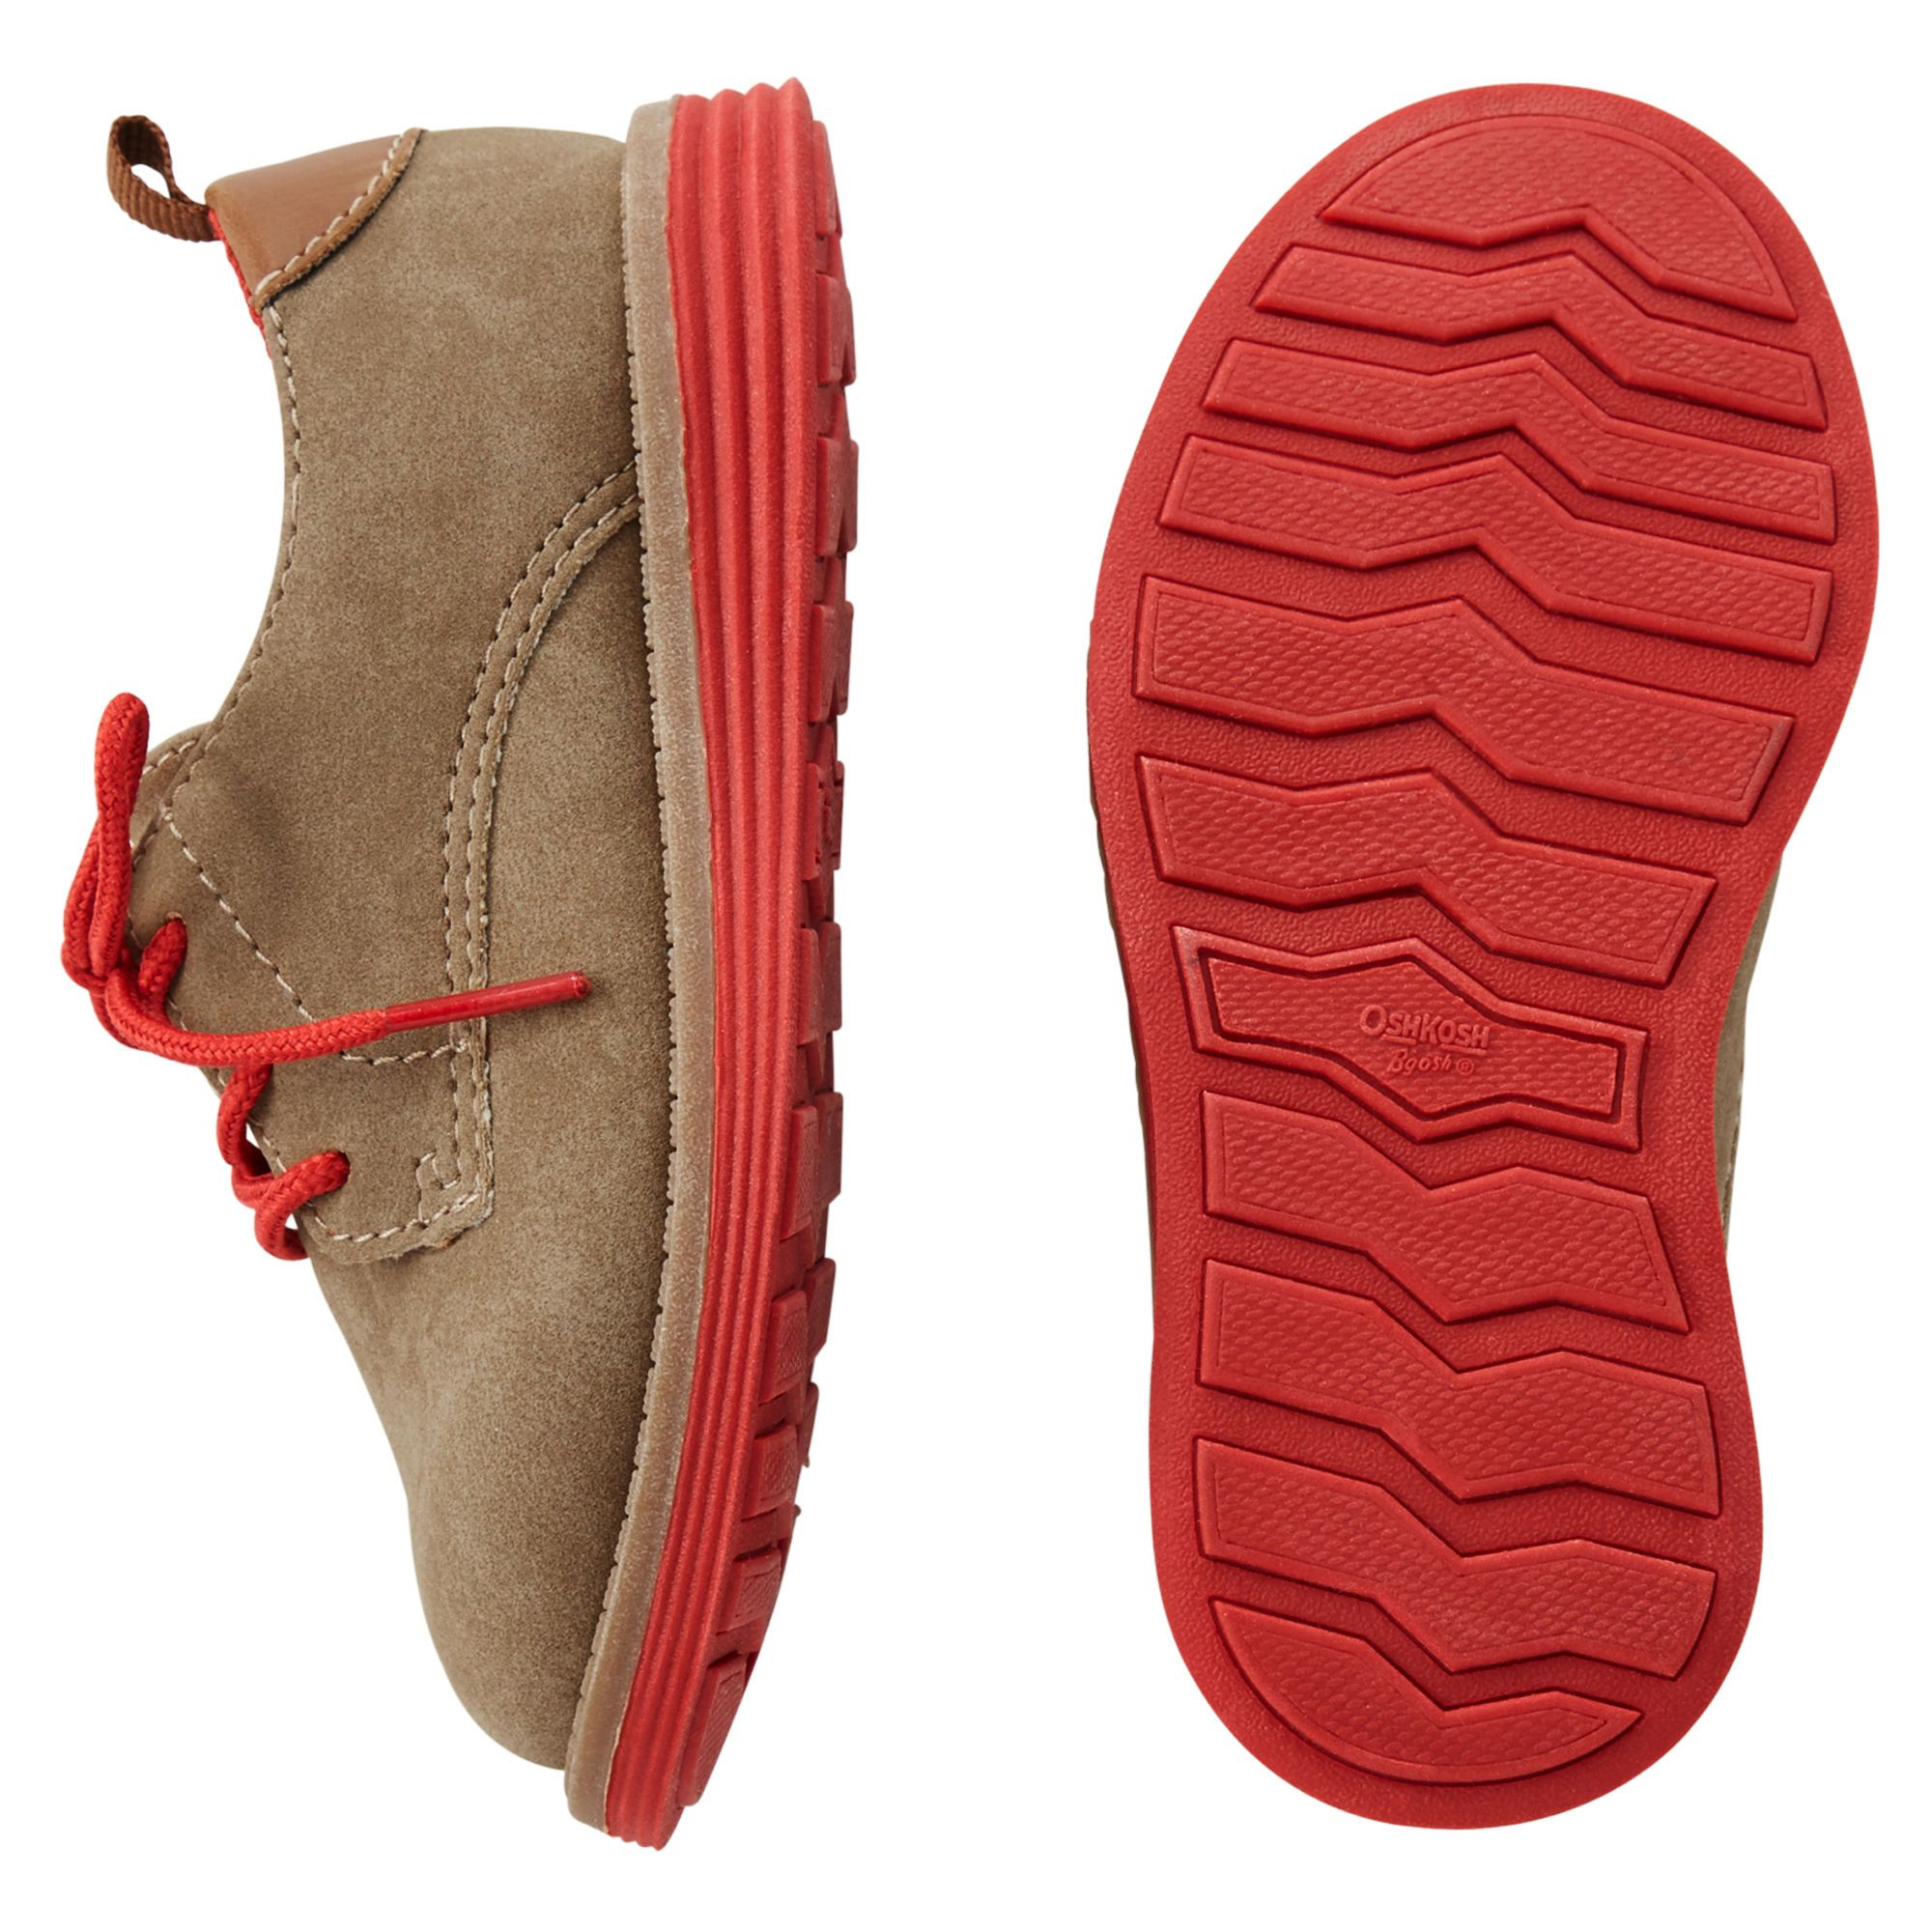 OshKosh Oxford Shoes, Brown